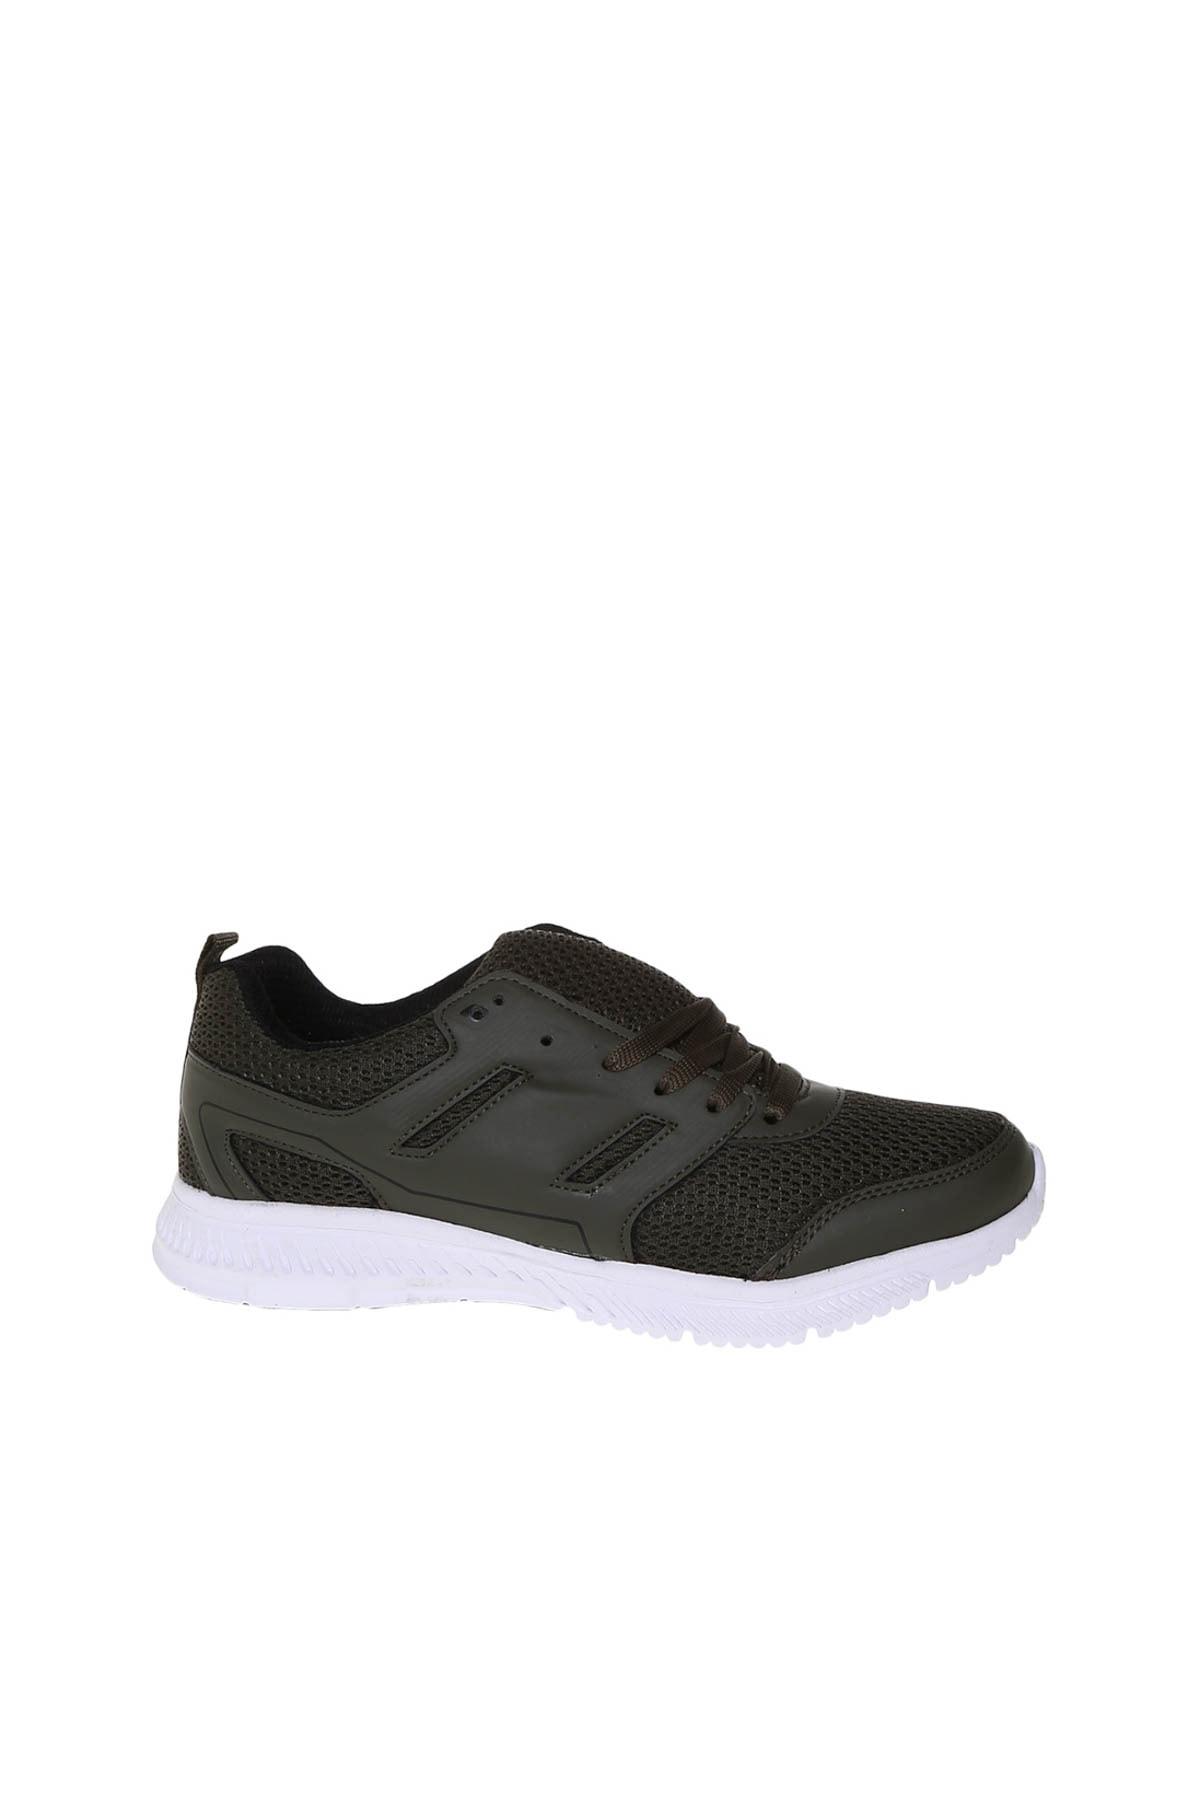 LİMON COMPANY Sneakers 1